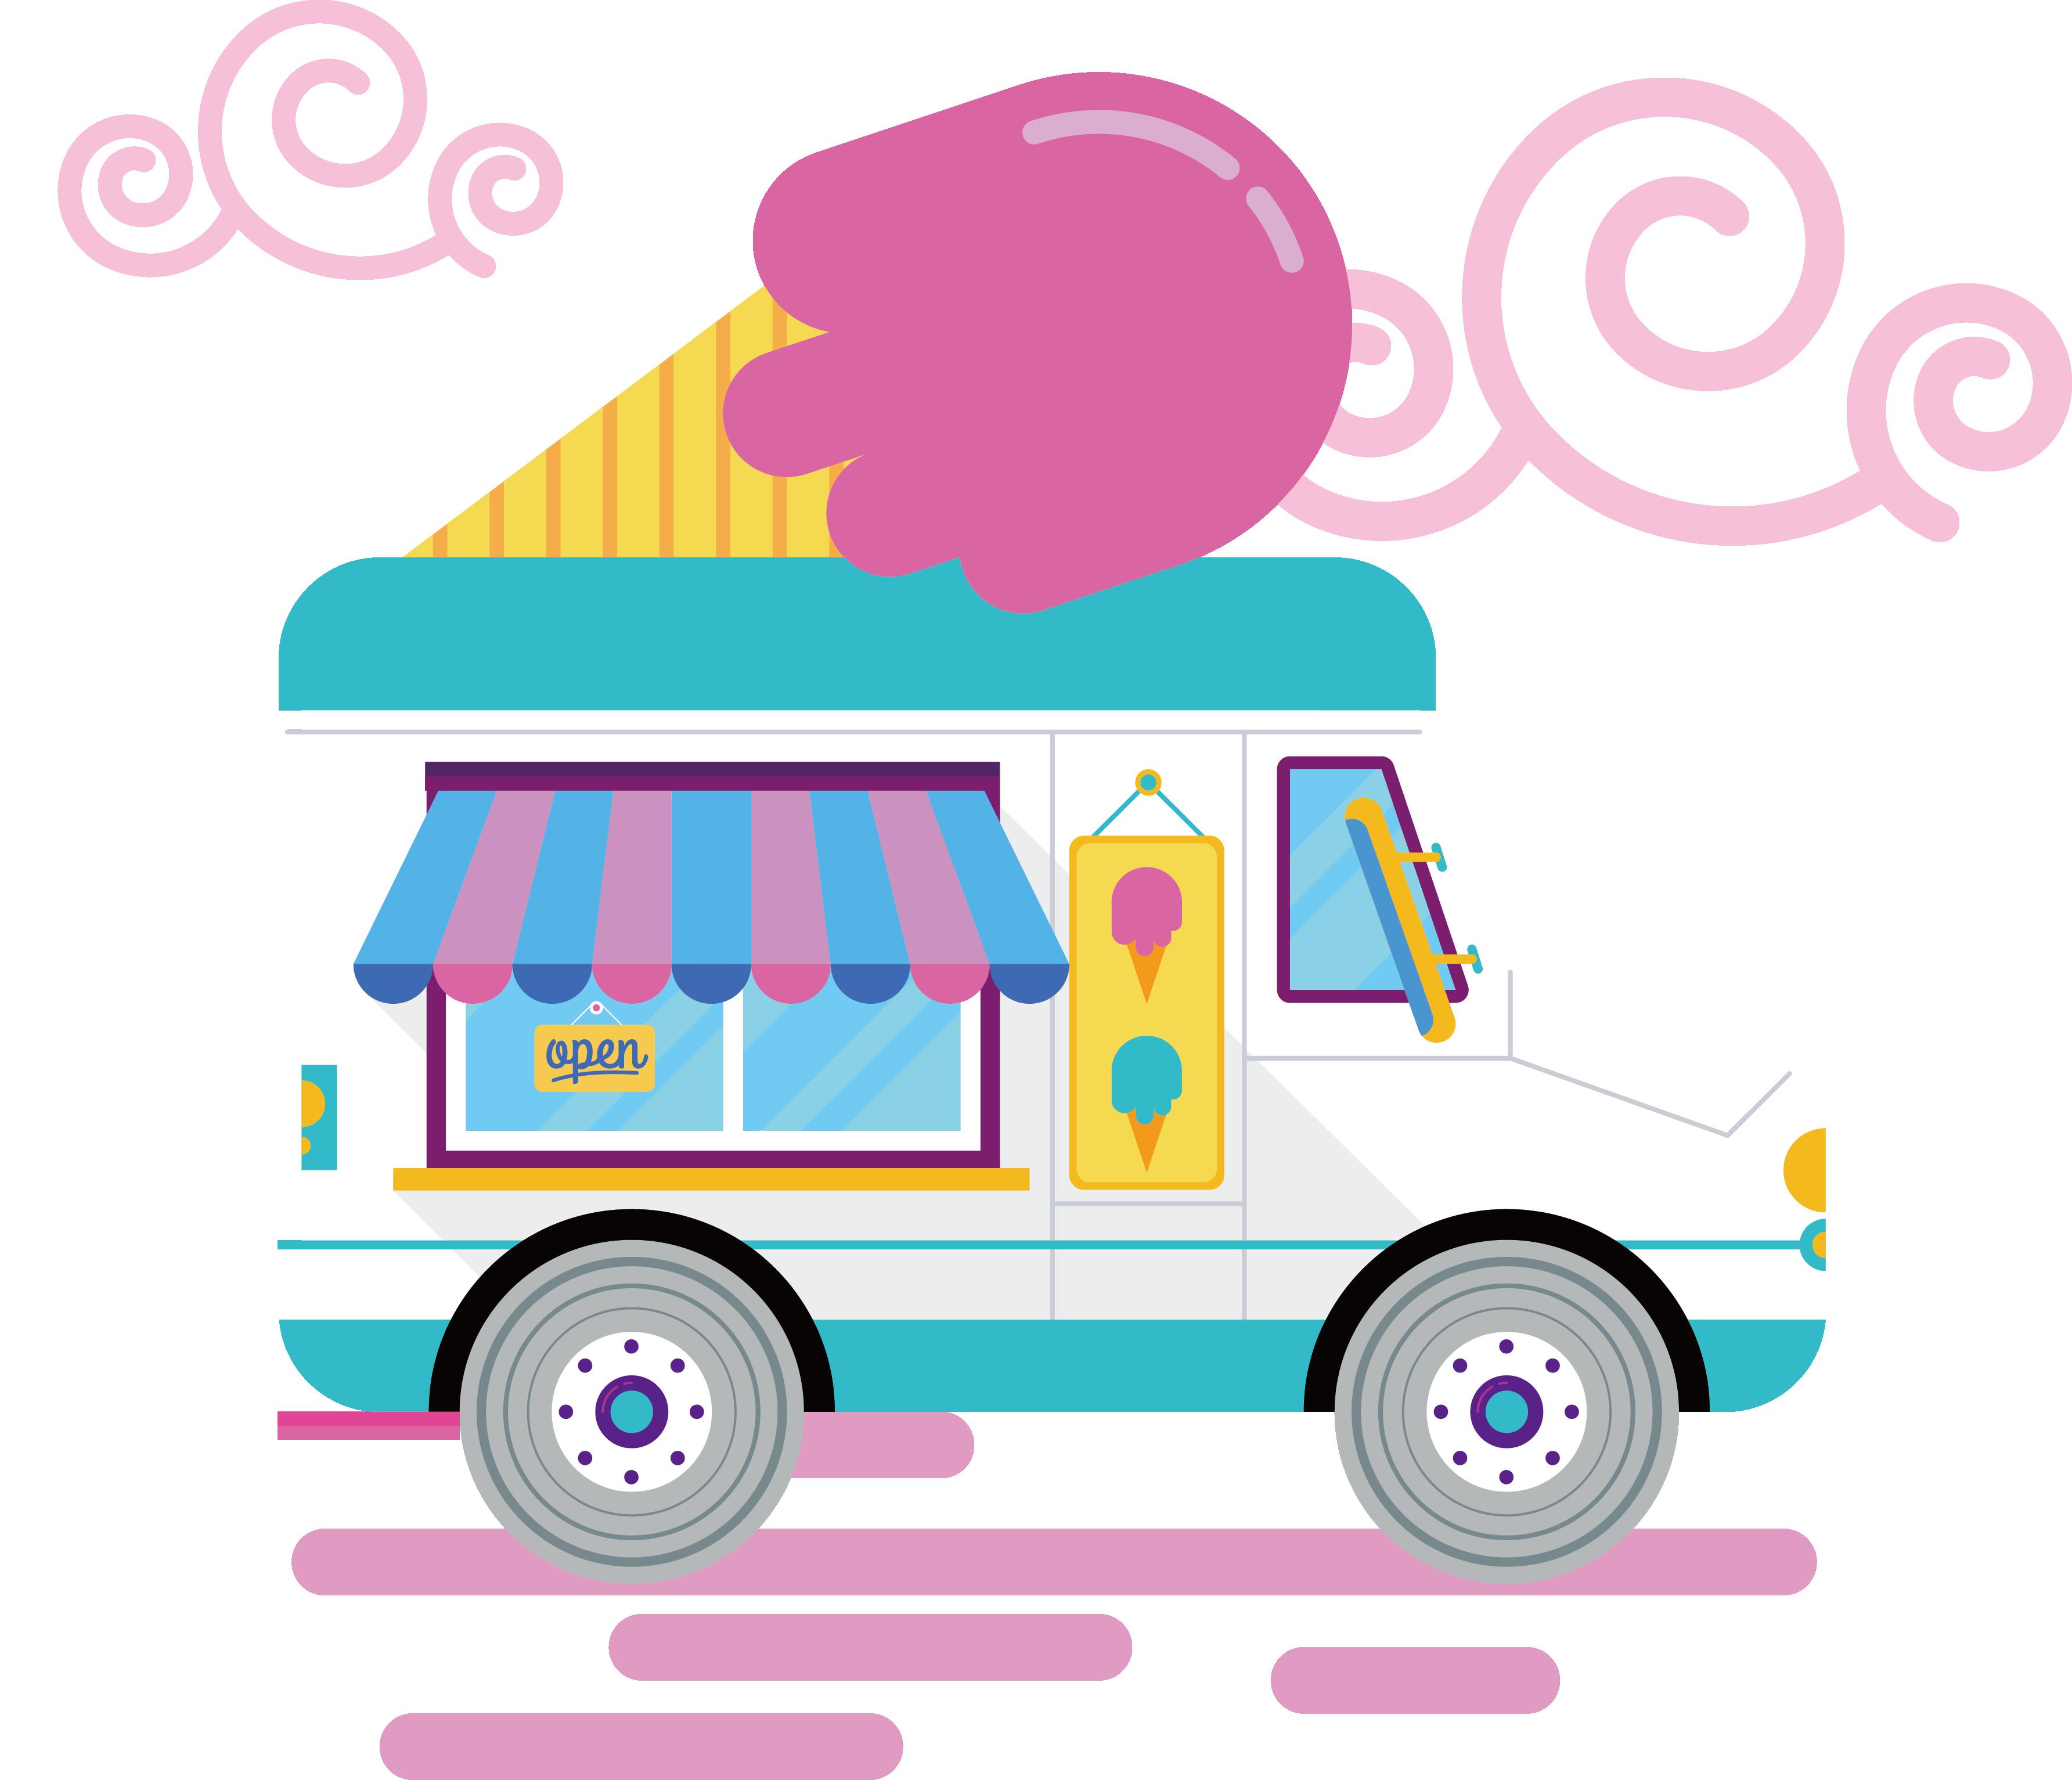 Van big gay driving. Clipart car ice cream